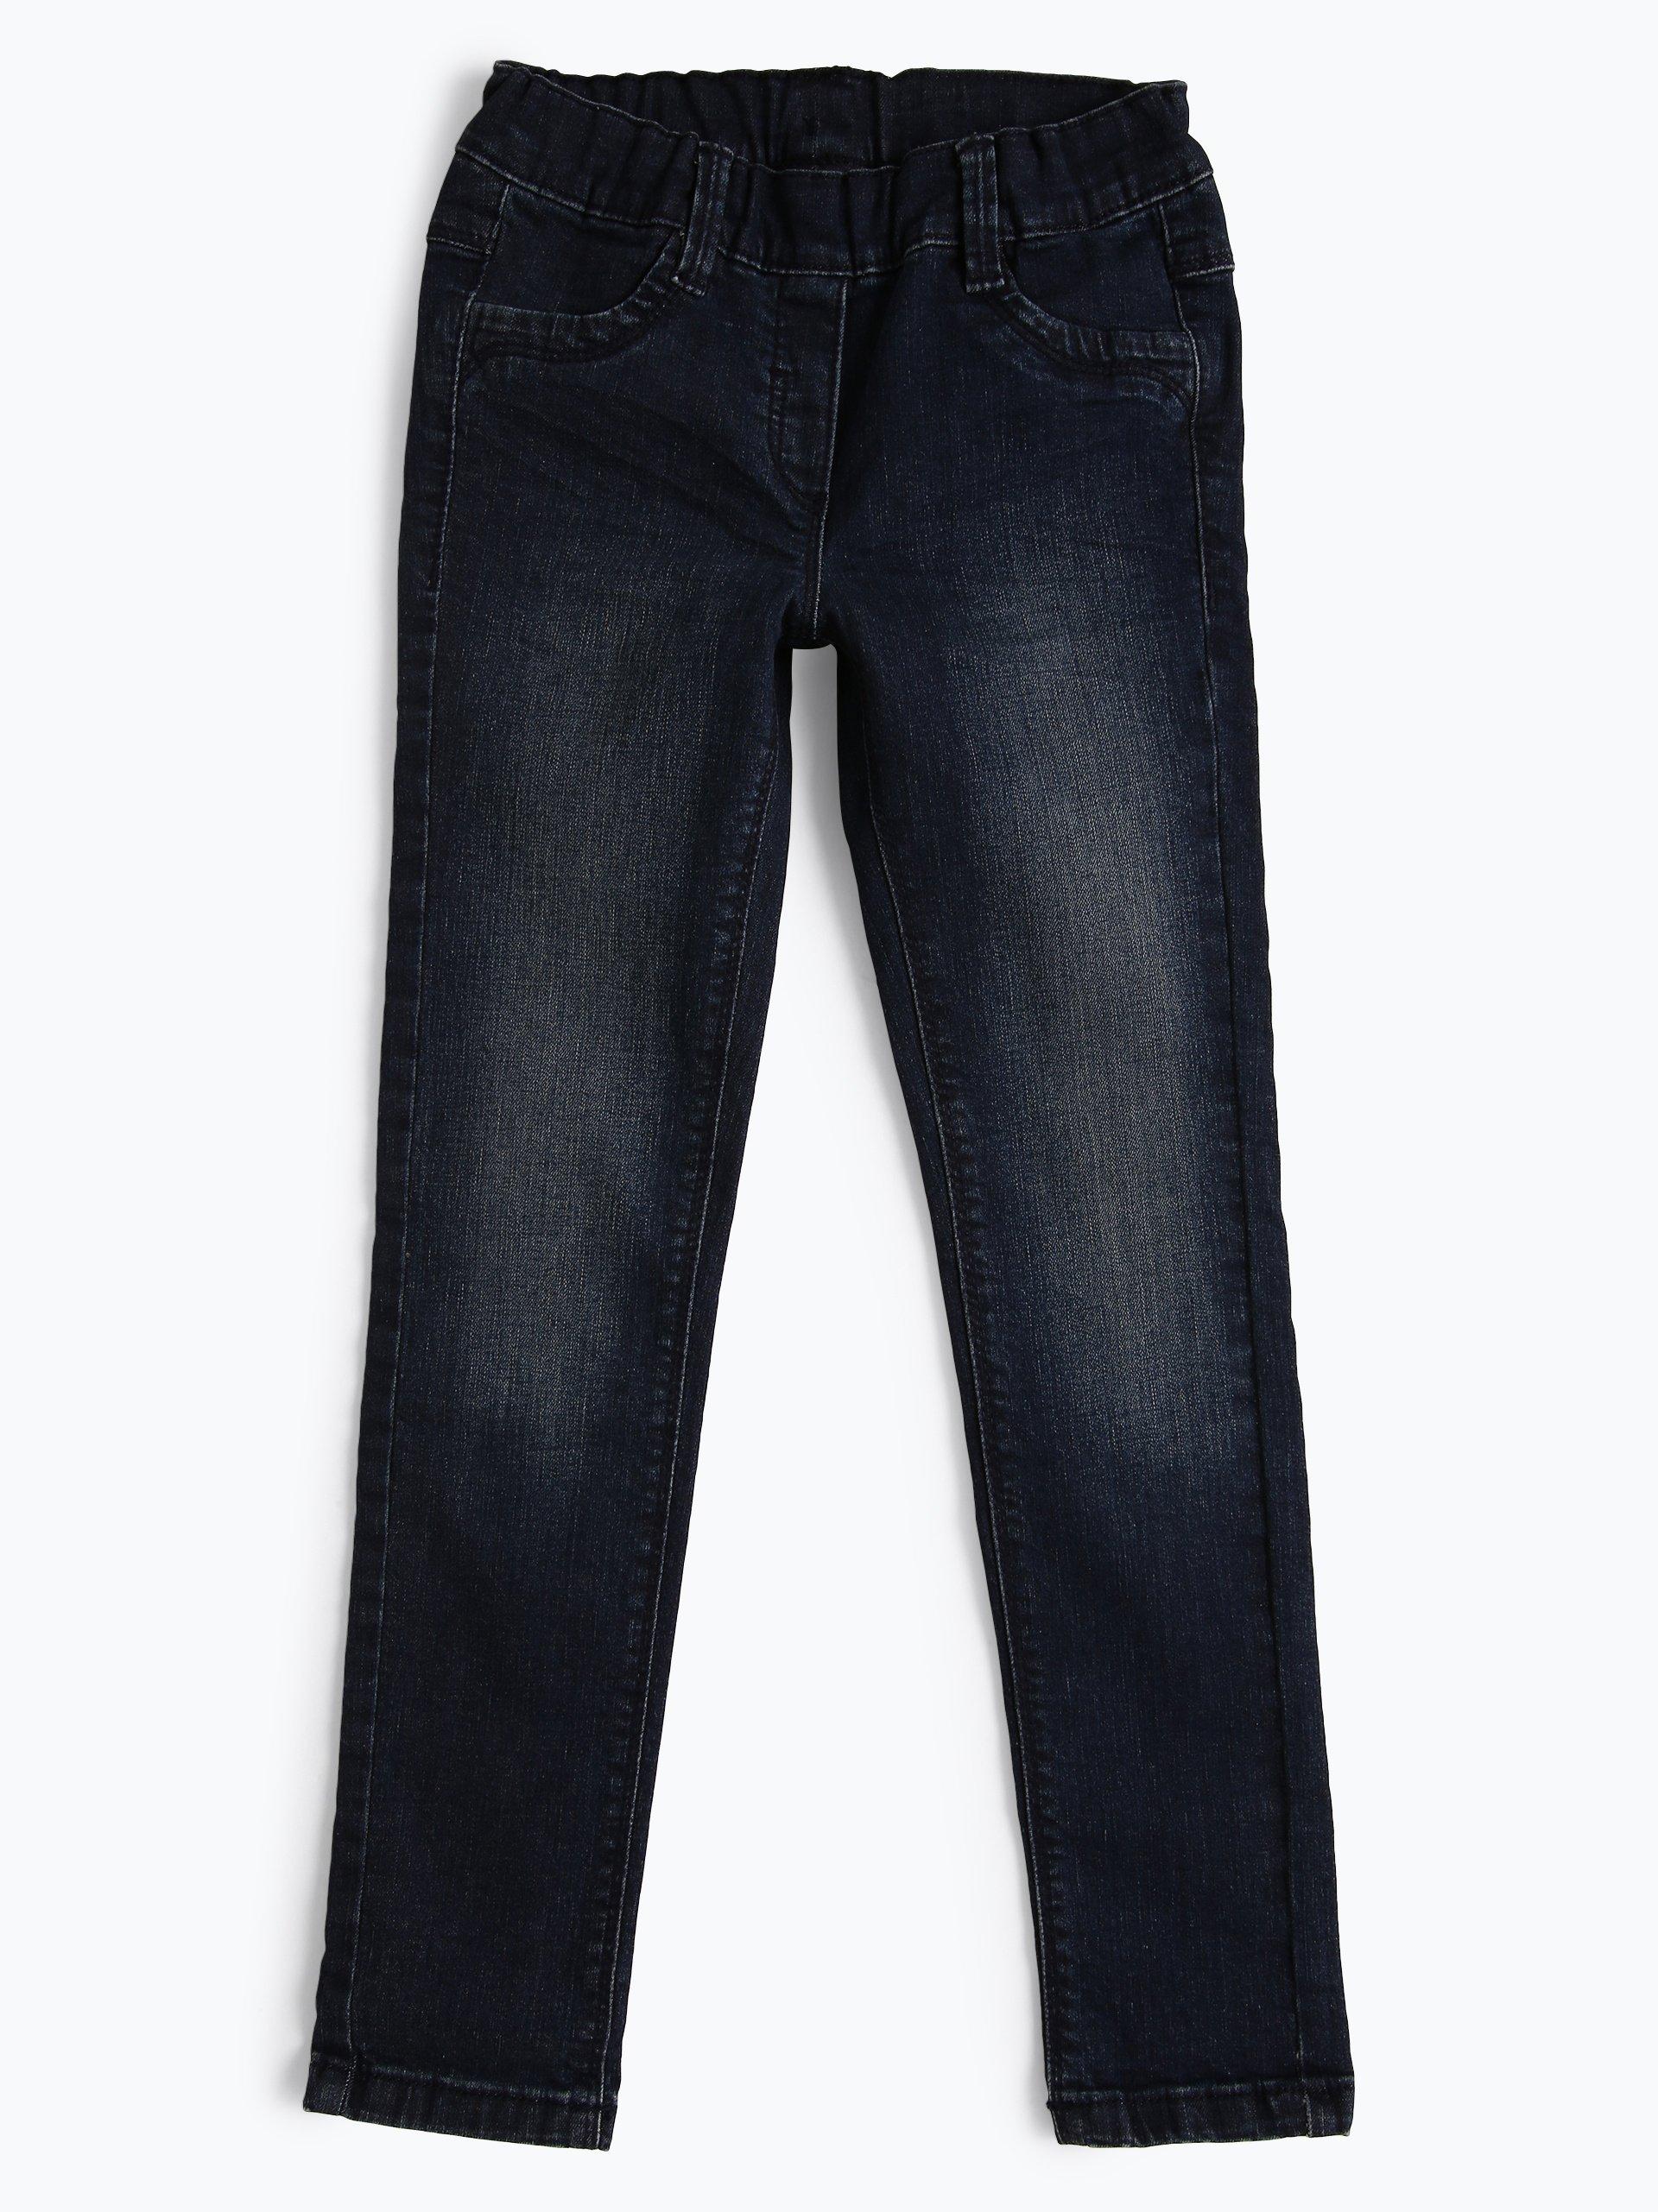 s.Oliver Casual Mädchen Jeans - Skinny Leg